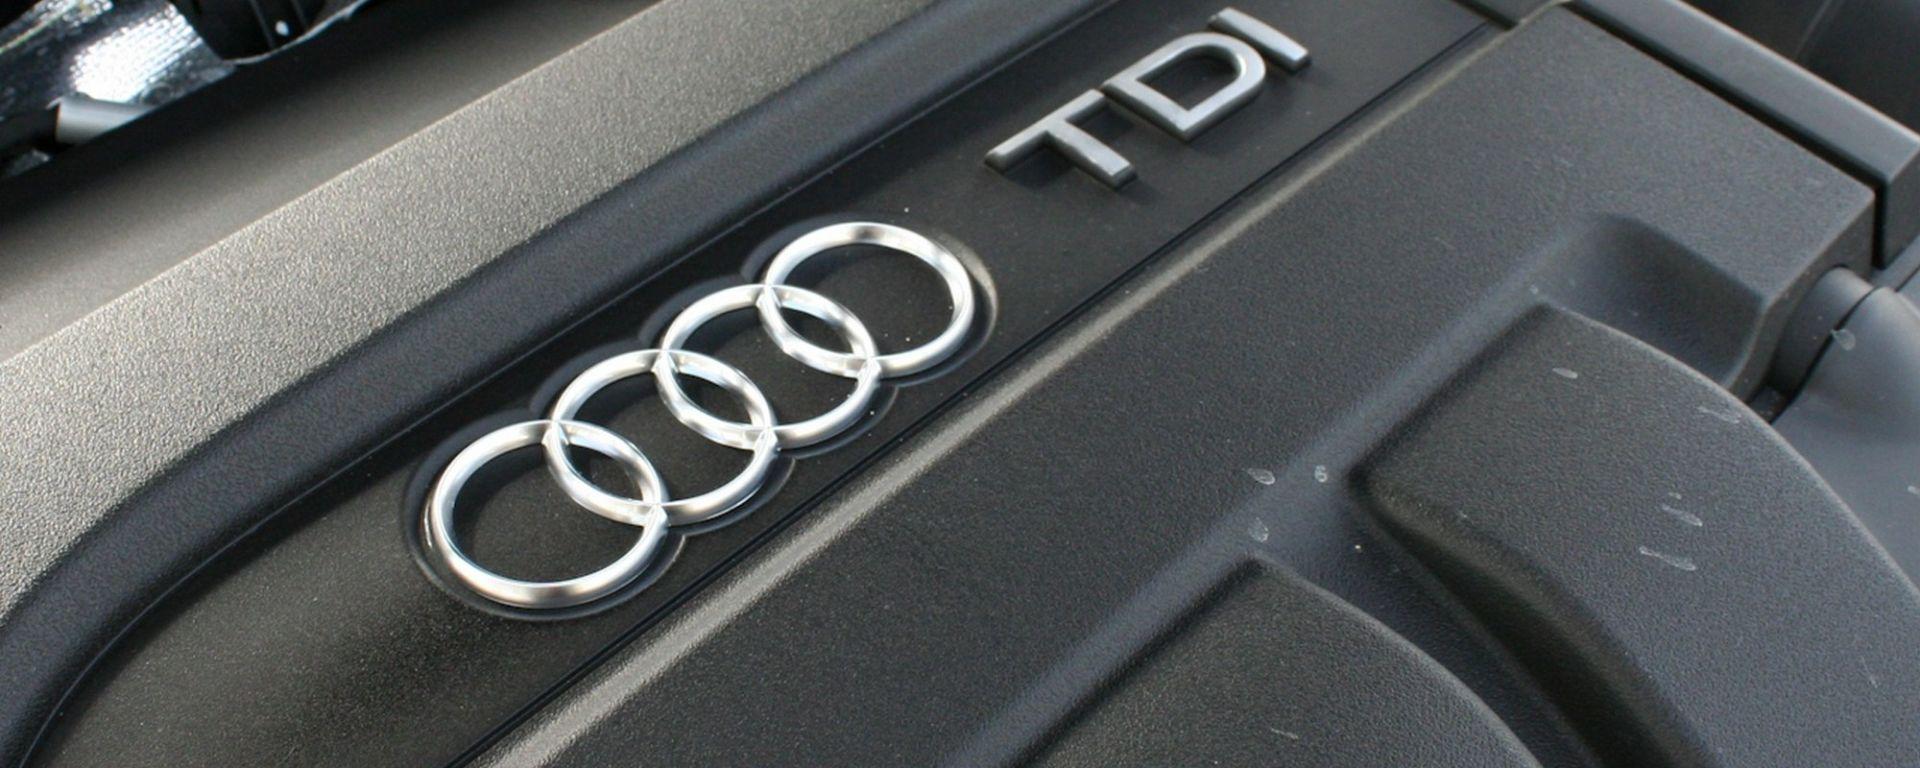 Audi, maxi richiamo per modelli V6 e V8 TDI